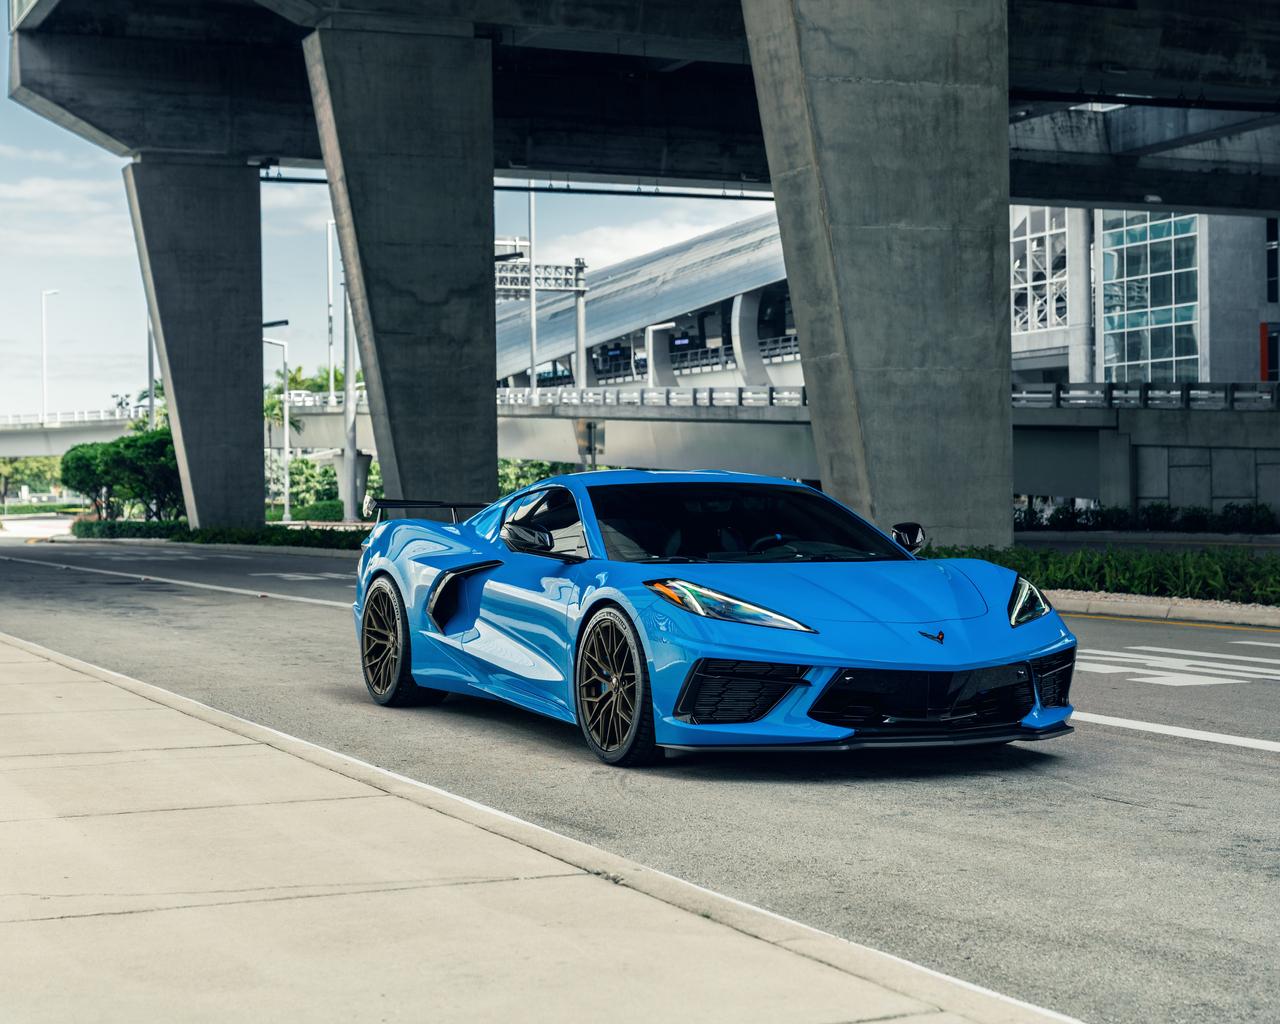 corvette-c8-ag-mc-sick-blue-8k-q1.jpg